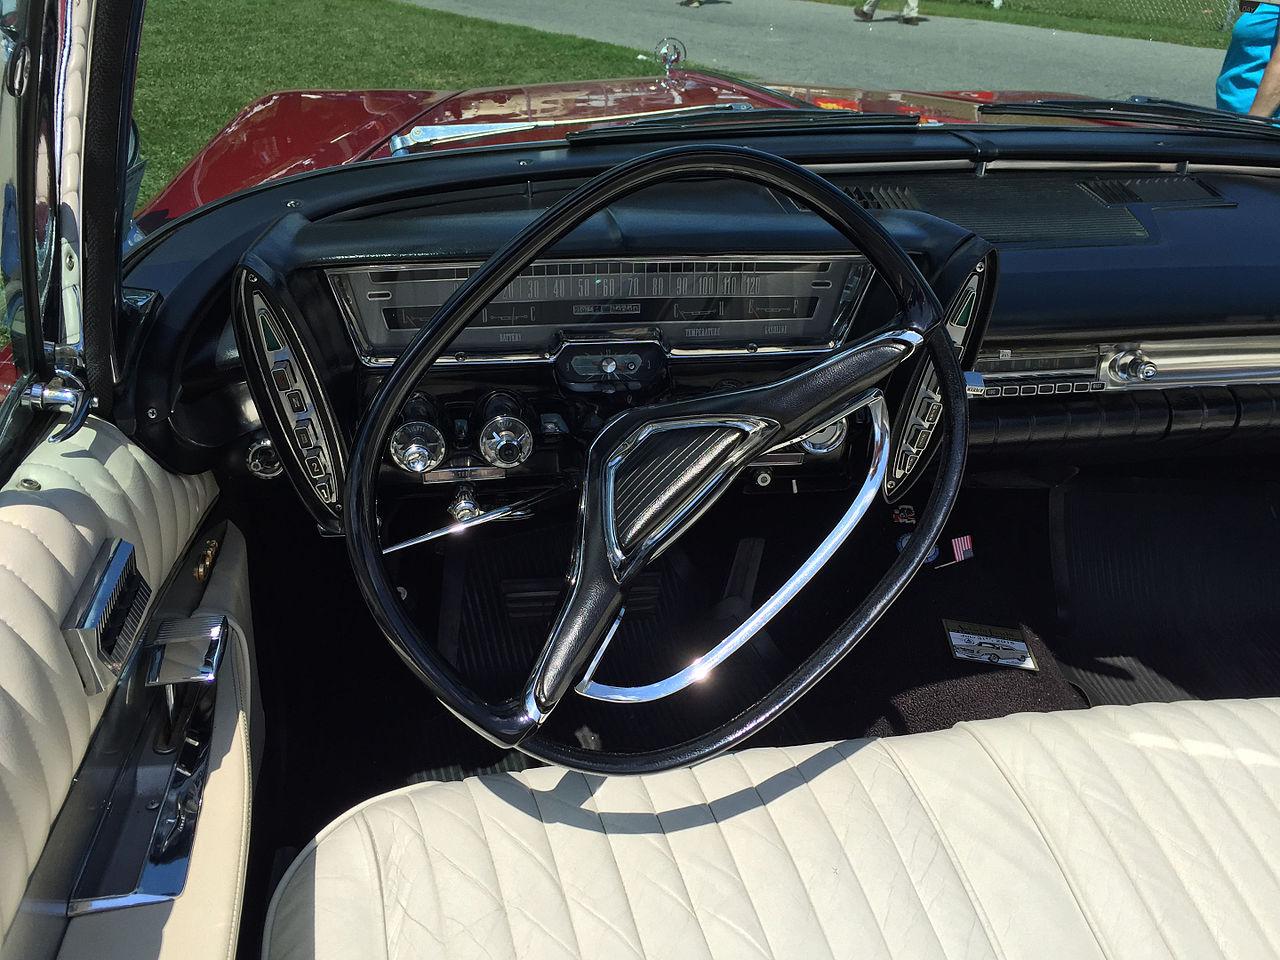 1962 Chrysler Imperial Crown Interior Myn Transport Blog